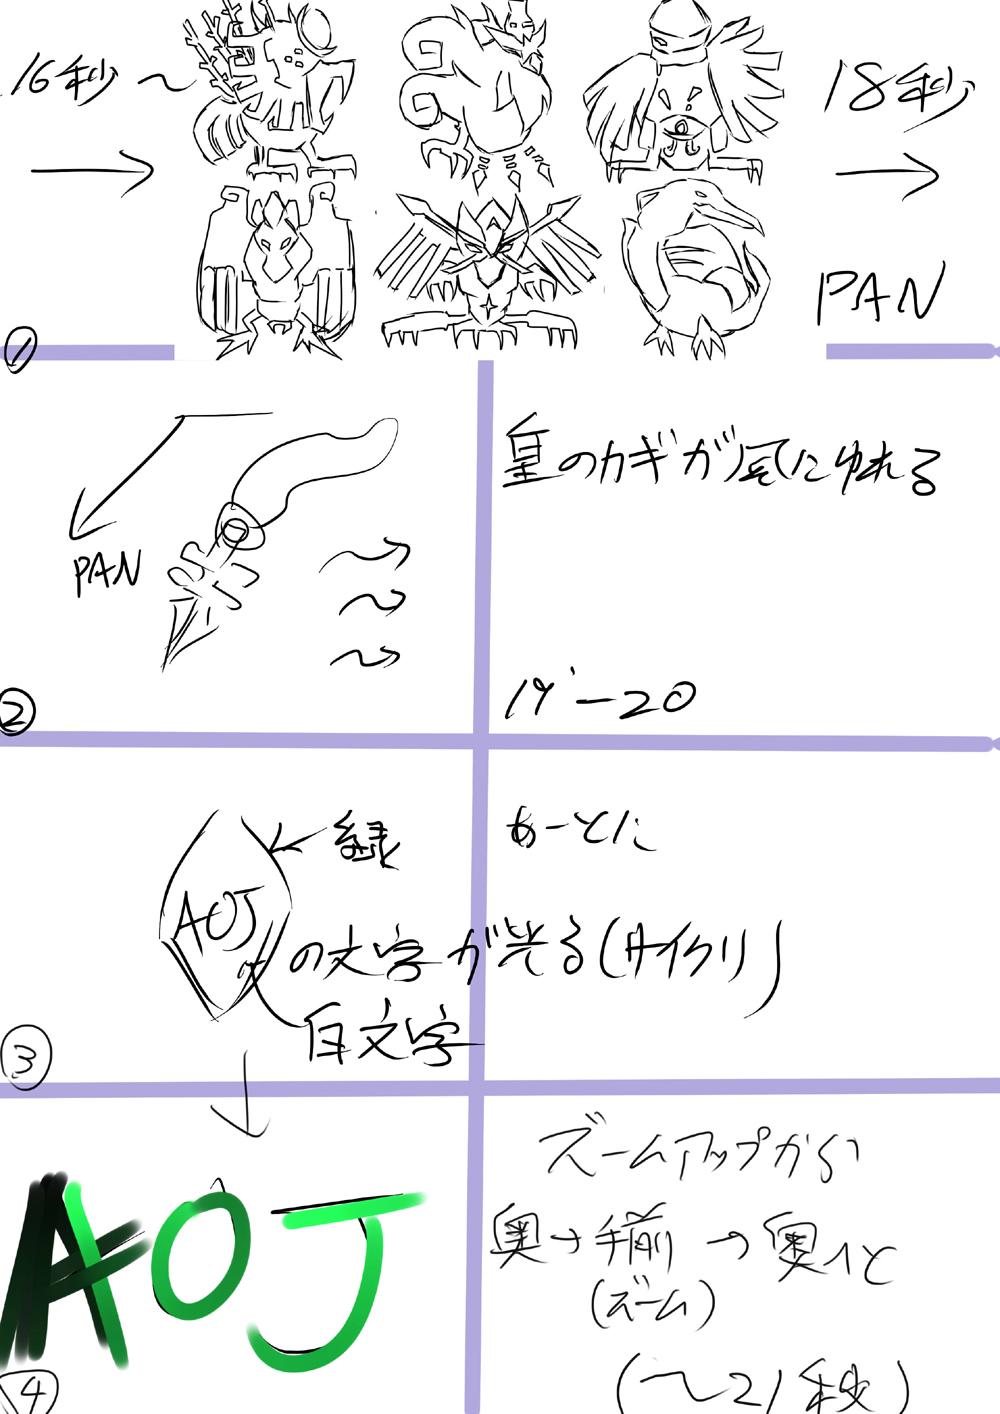 201304042150599de.jpg